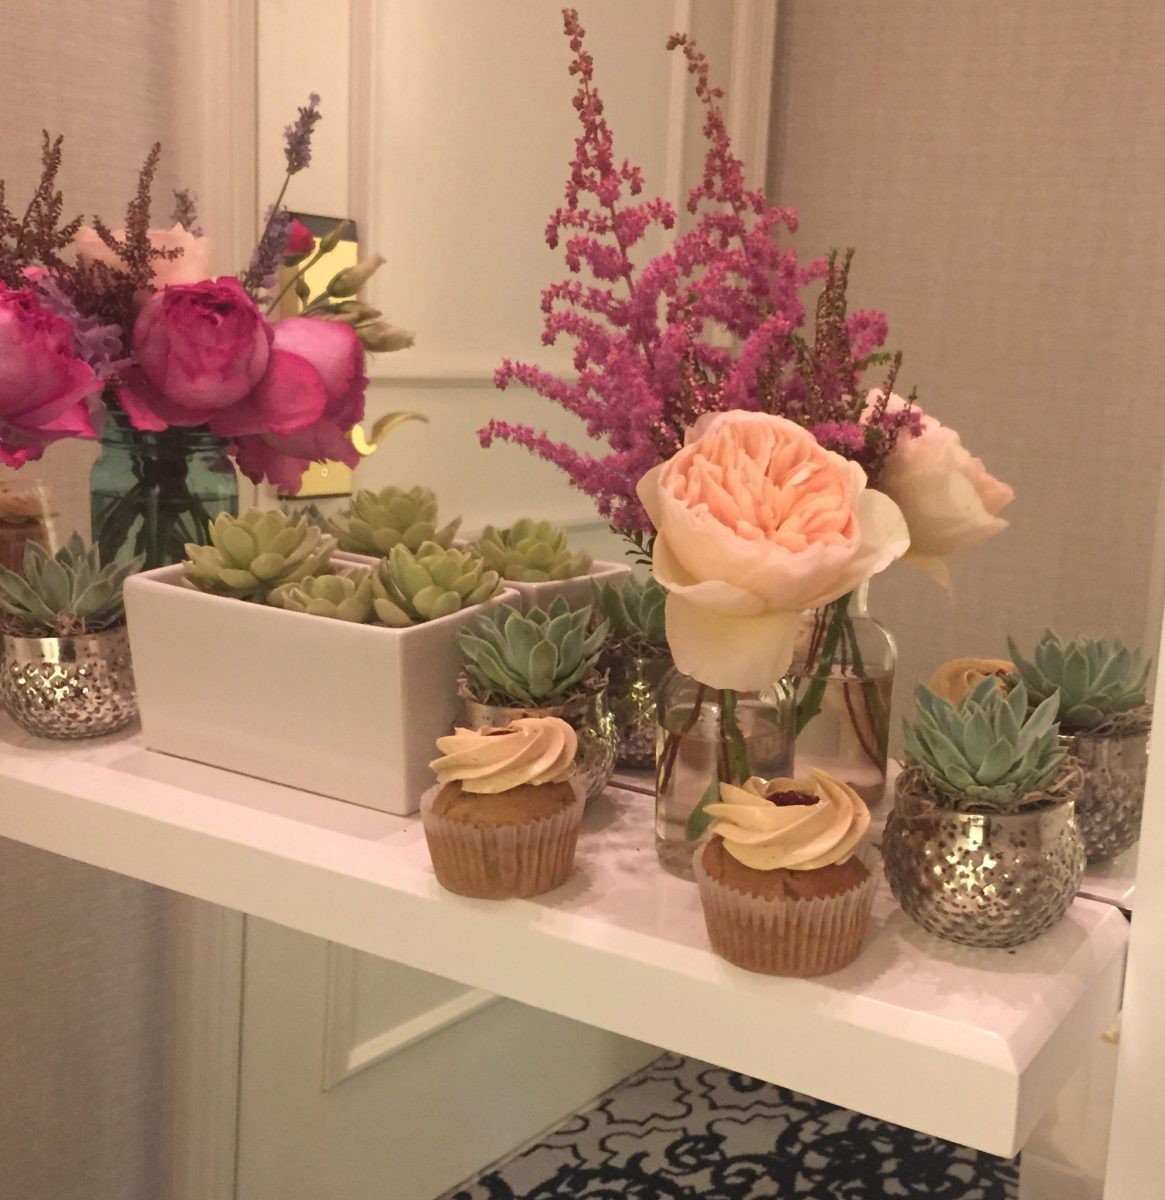 Ritz Carlton San Francisco, a.hana designs, cupcakes, flowers, wedding